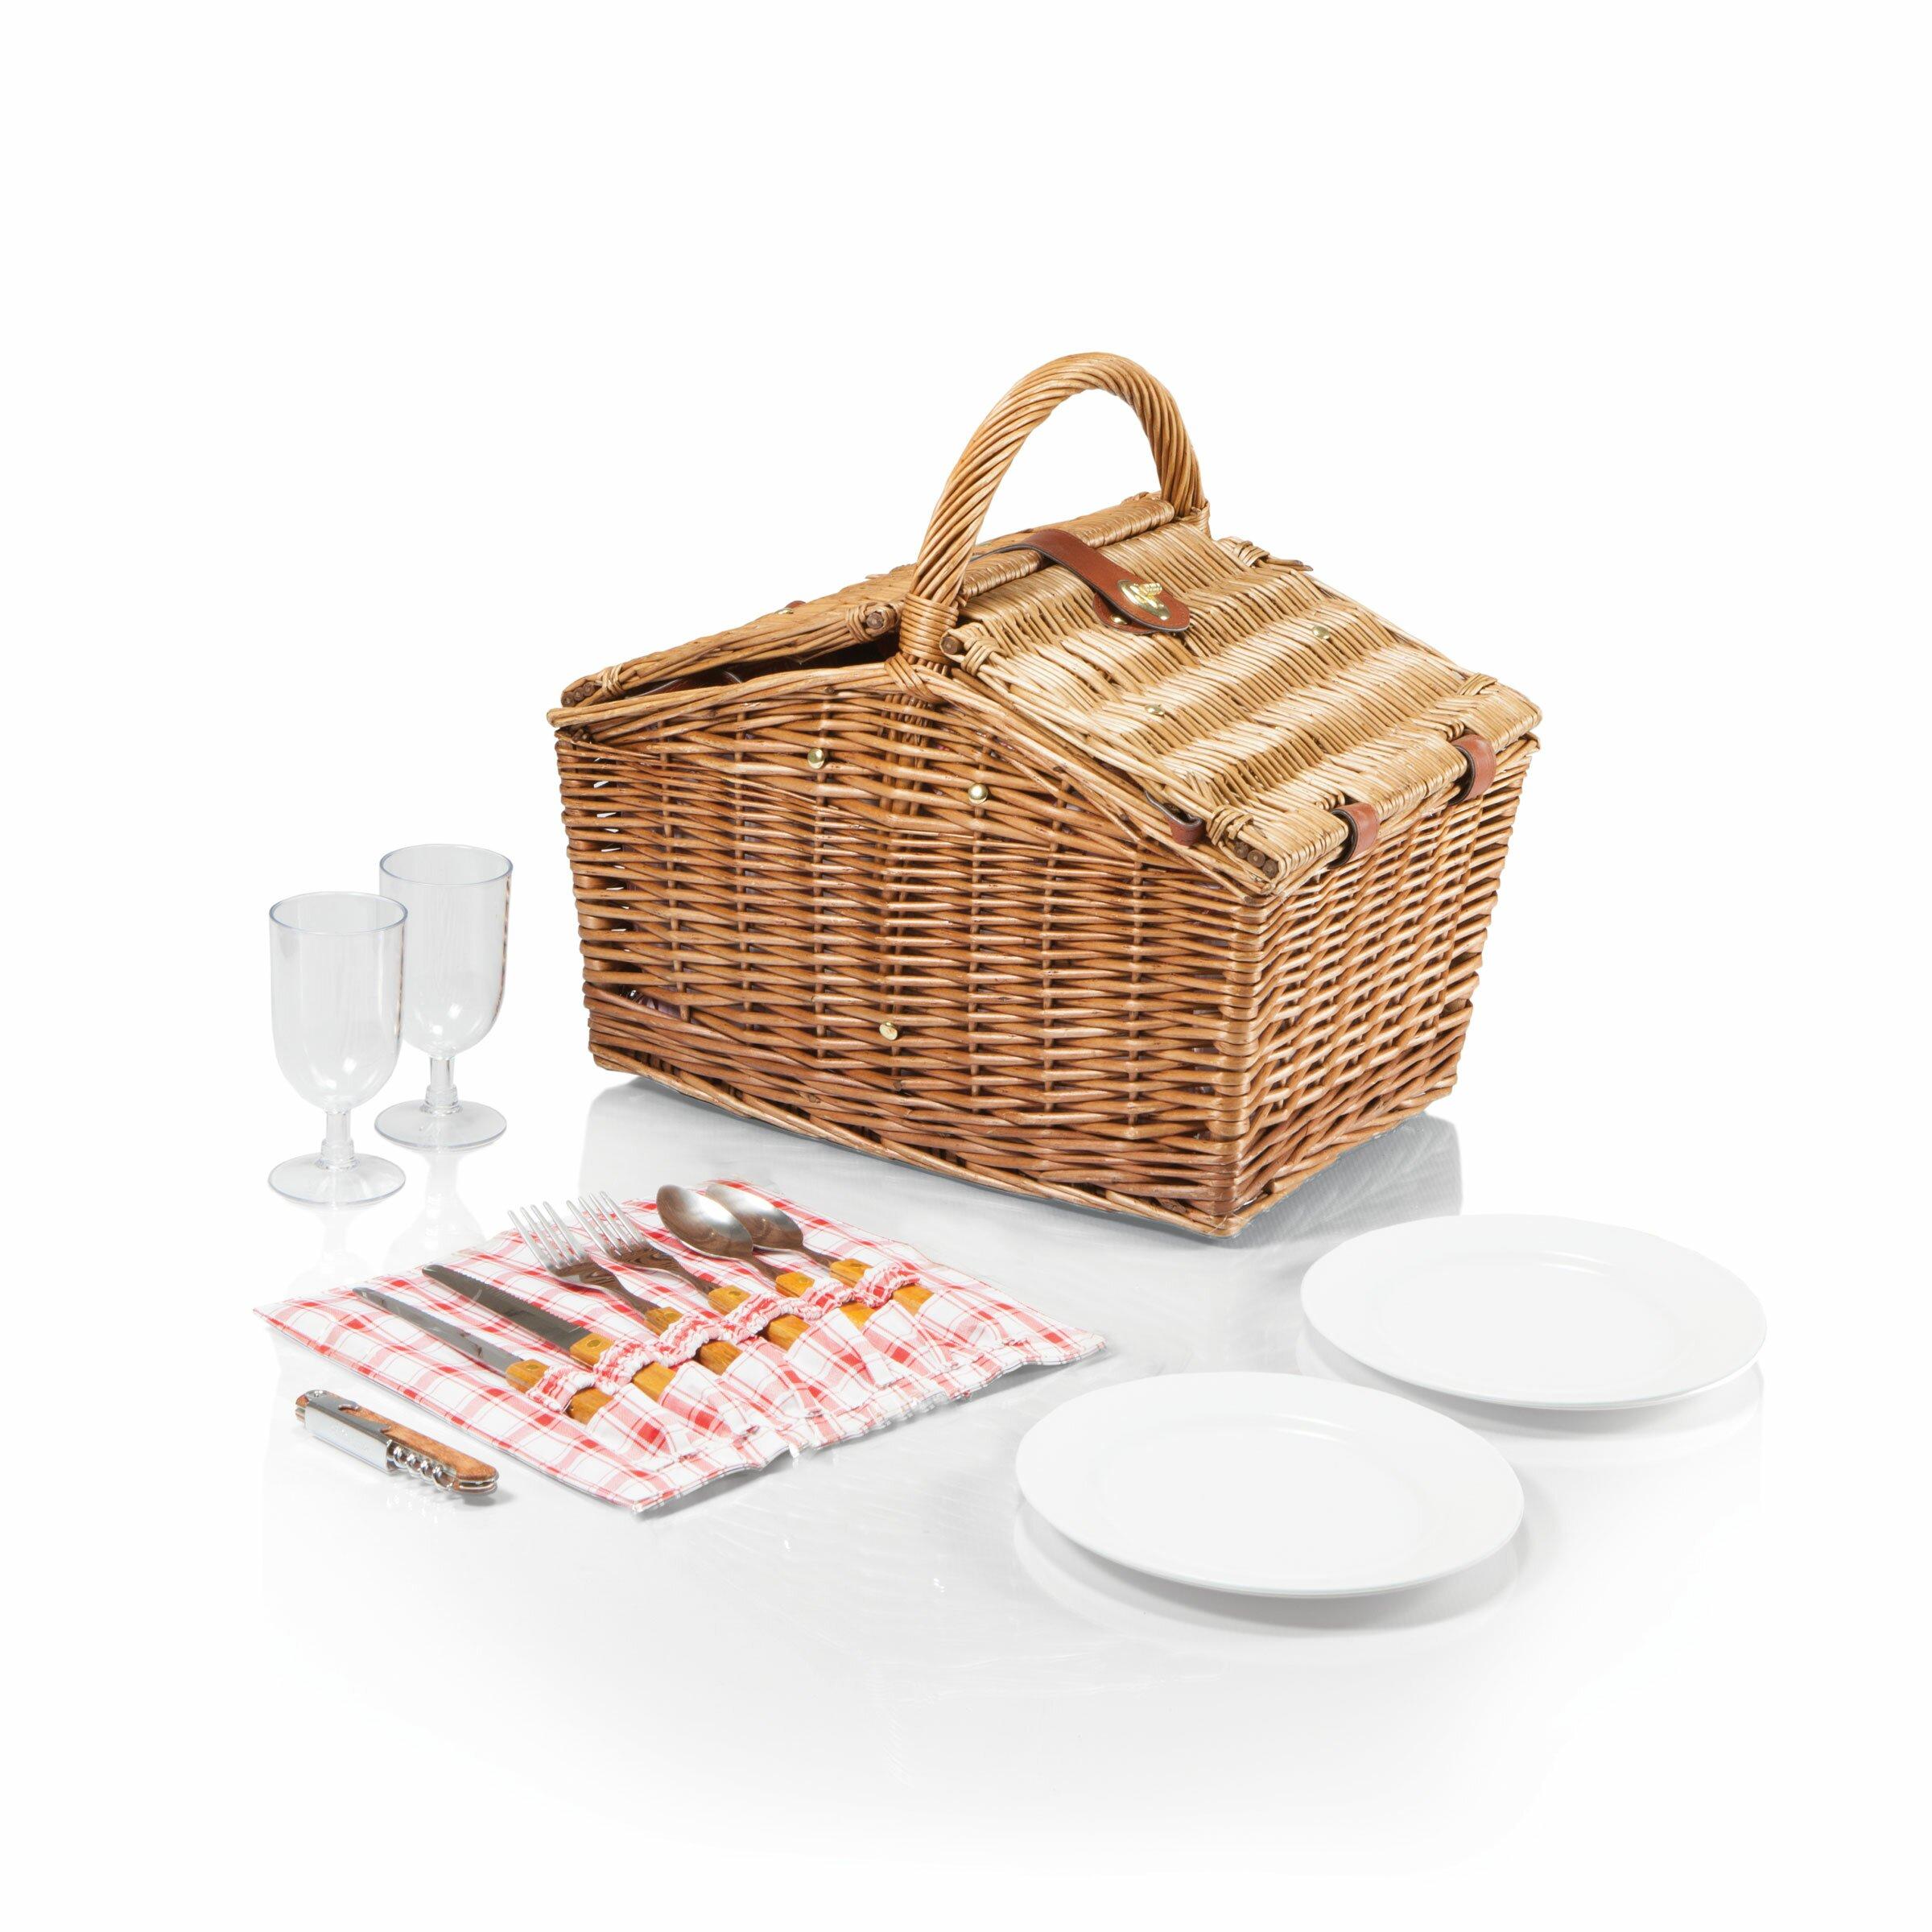 Picnic Basket Dish Set : Picnic time piccadilly basket set reviews wayfair